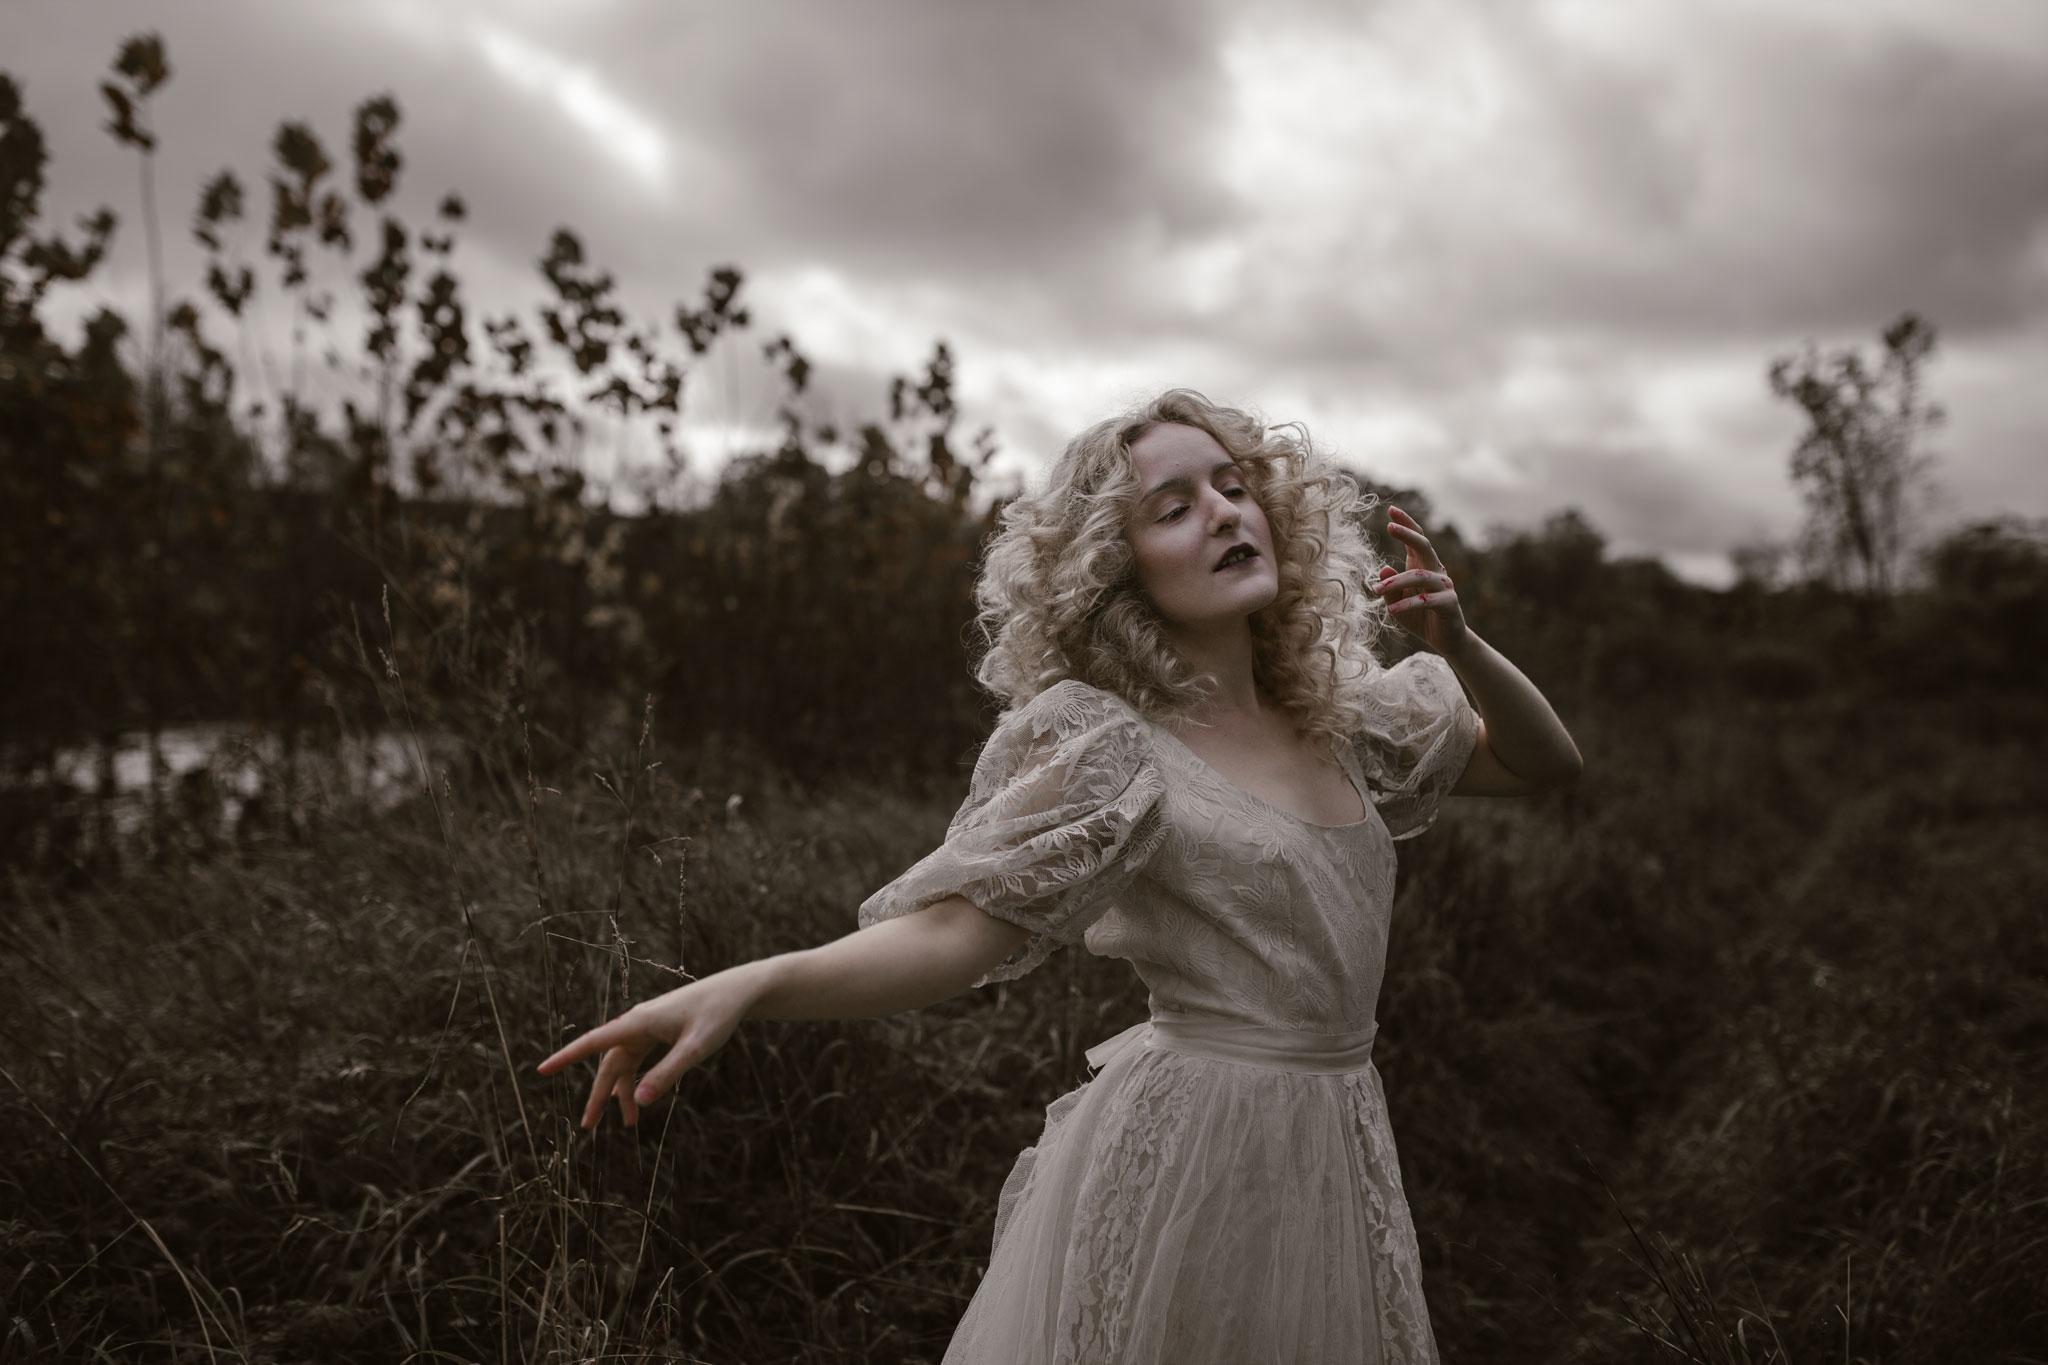 pale-witch-047fb.jpg